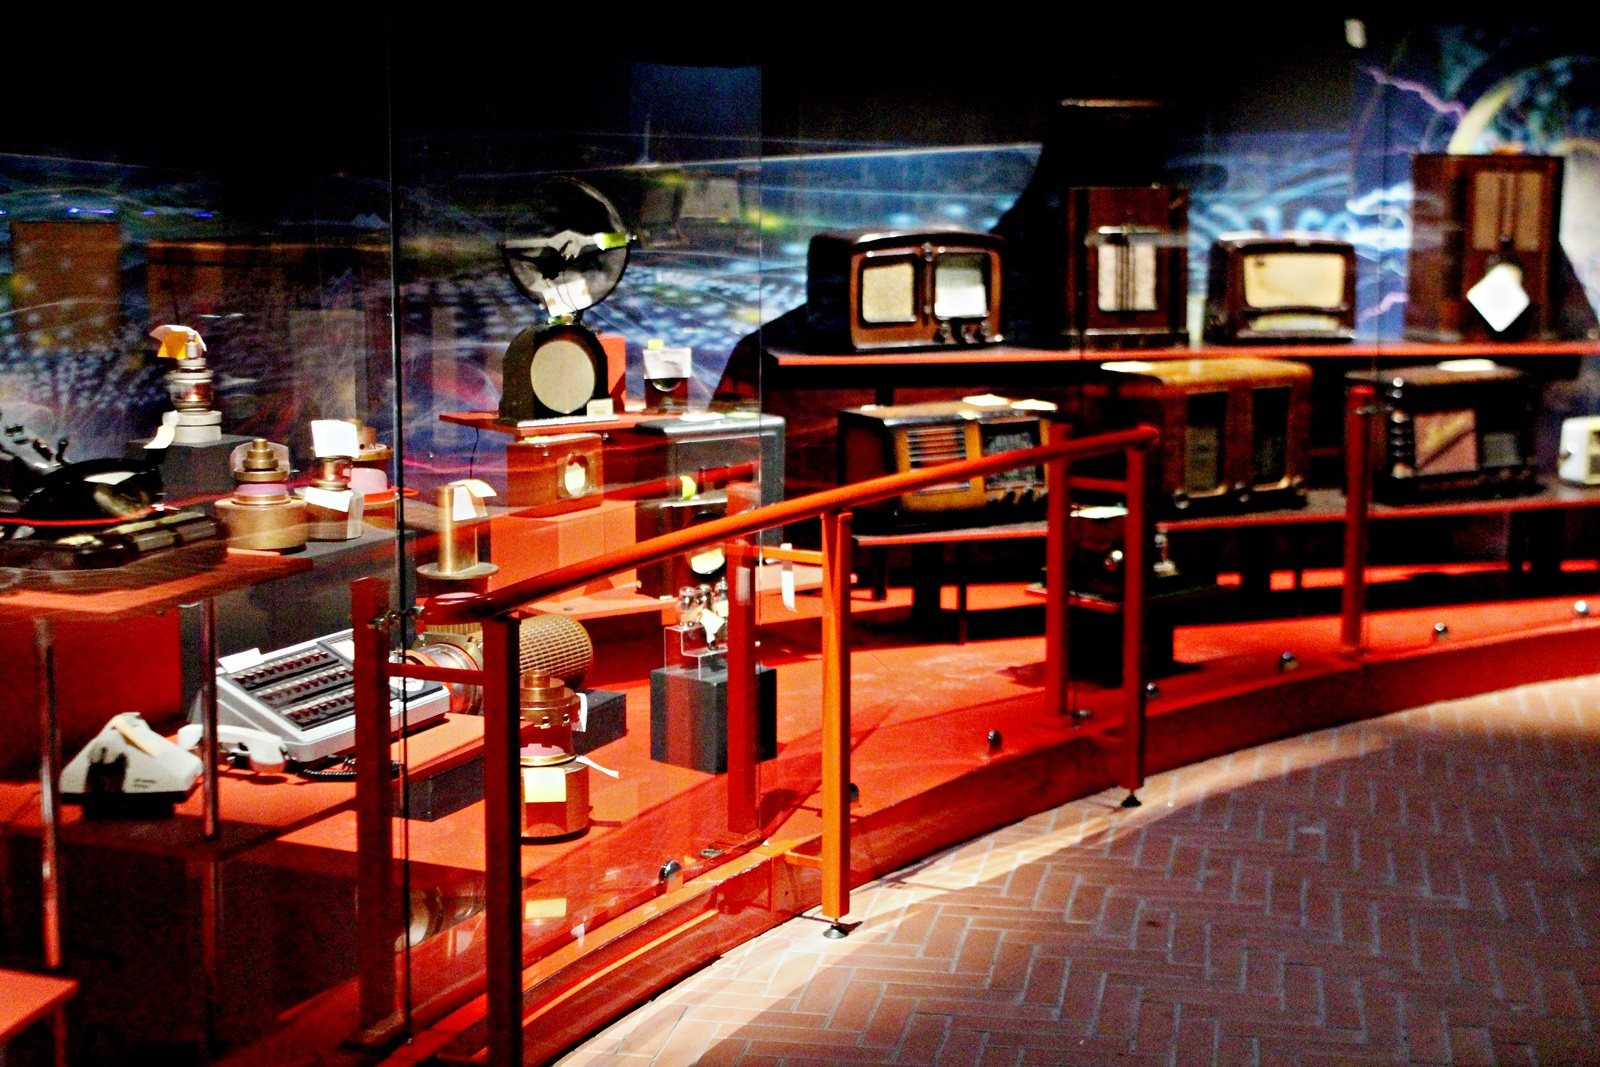 Музей науки и техники смотреть фото